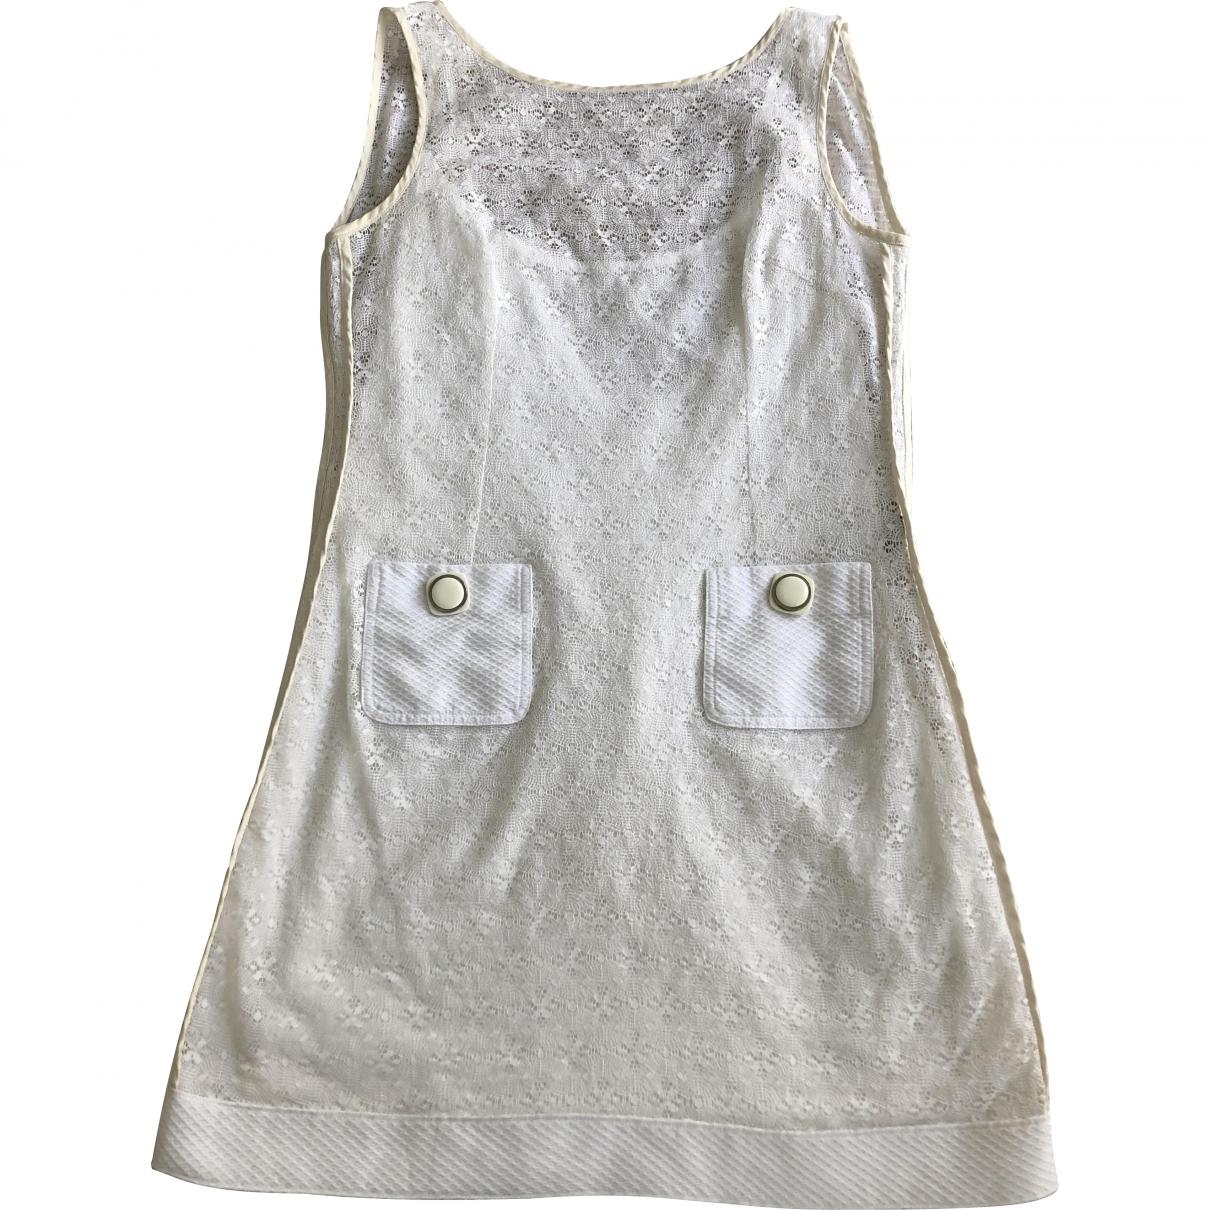 Dolce & Gabbana \N White dress for Women 40 IT